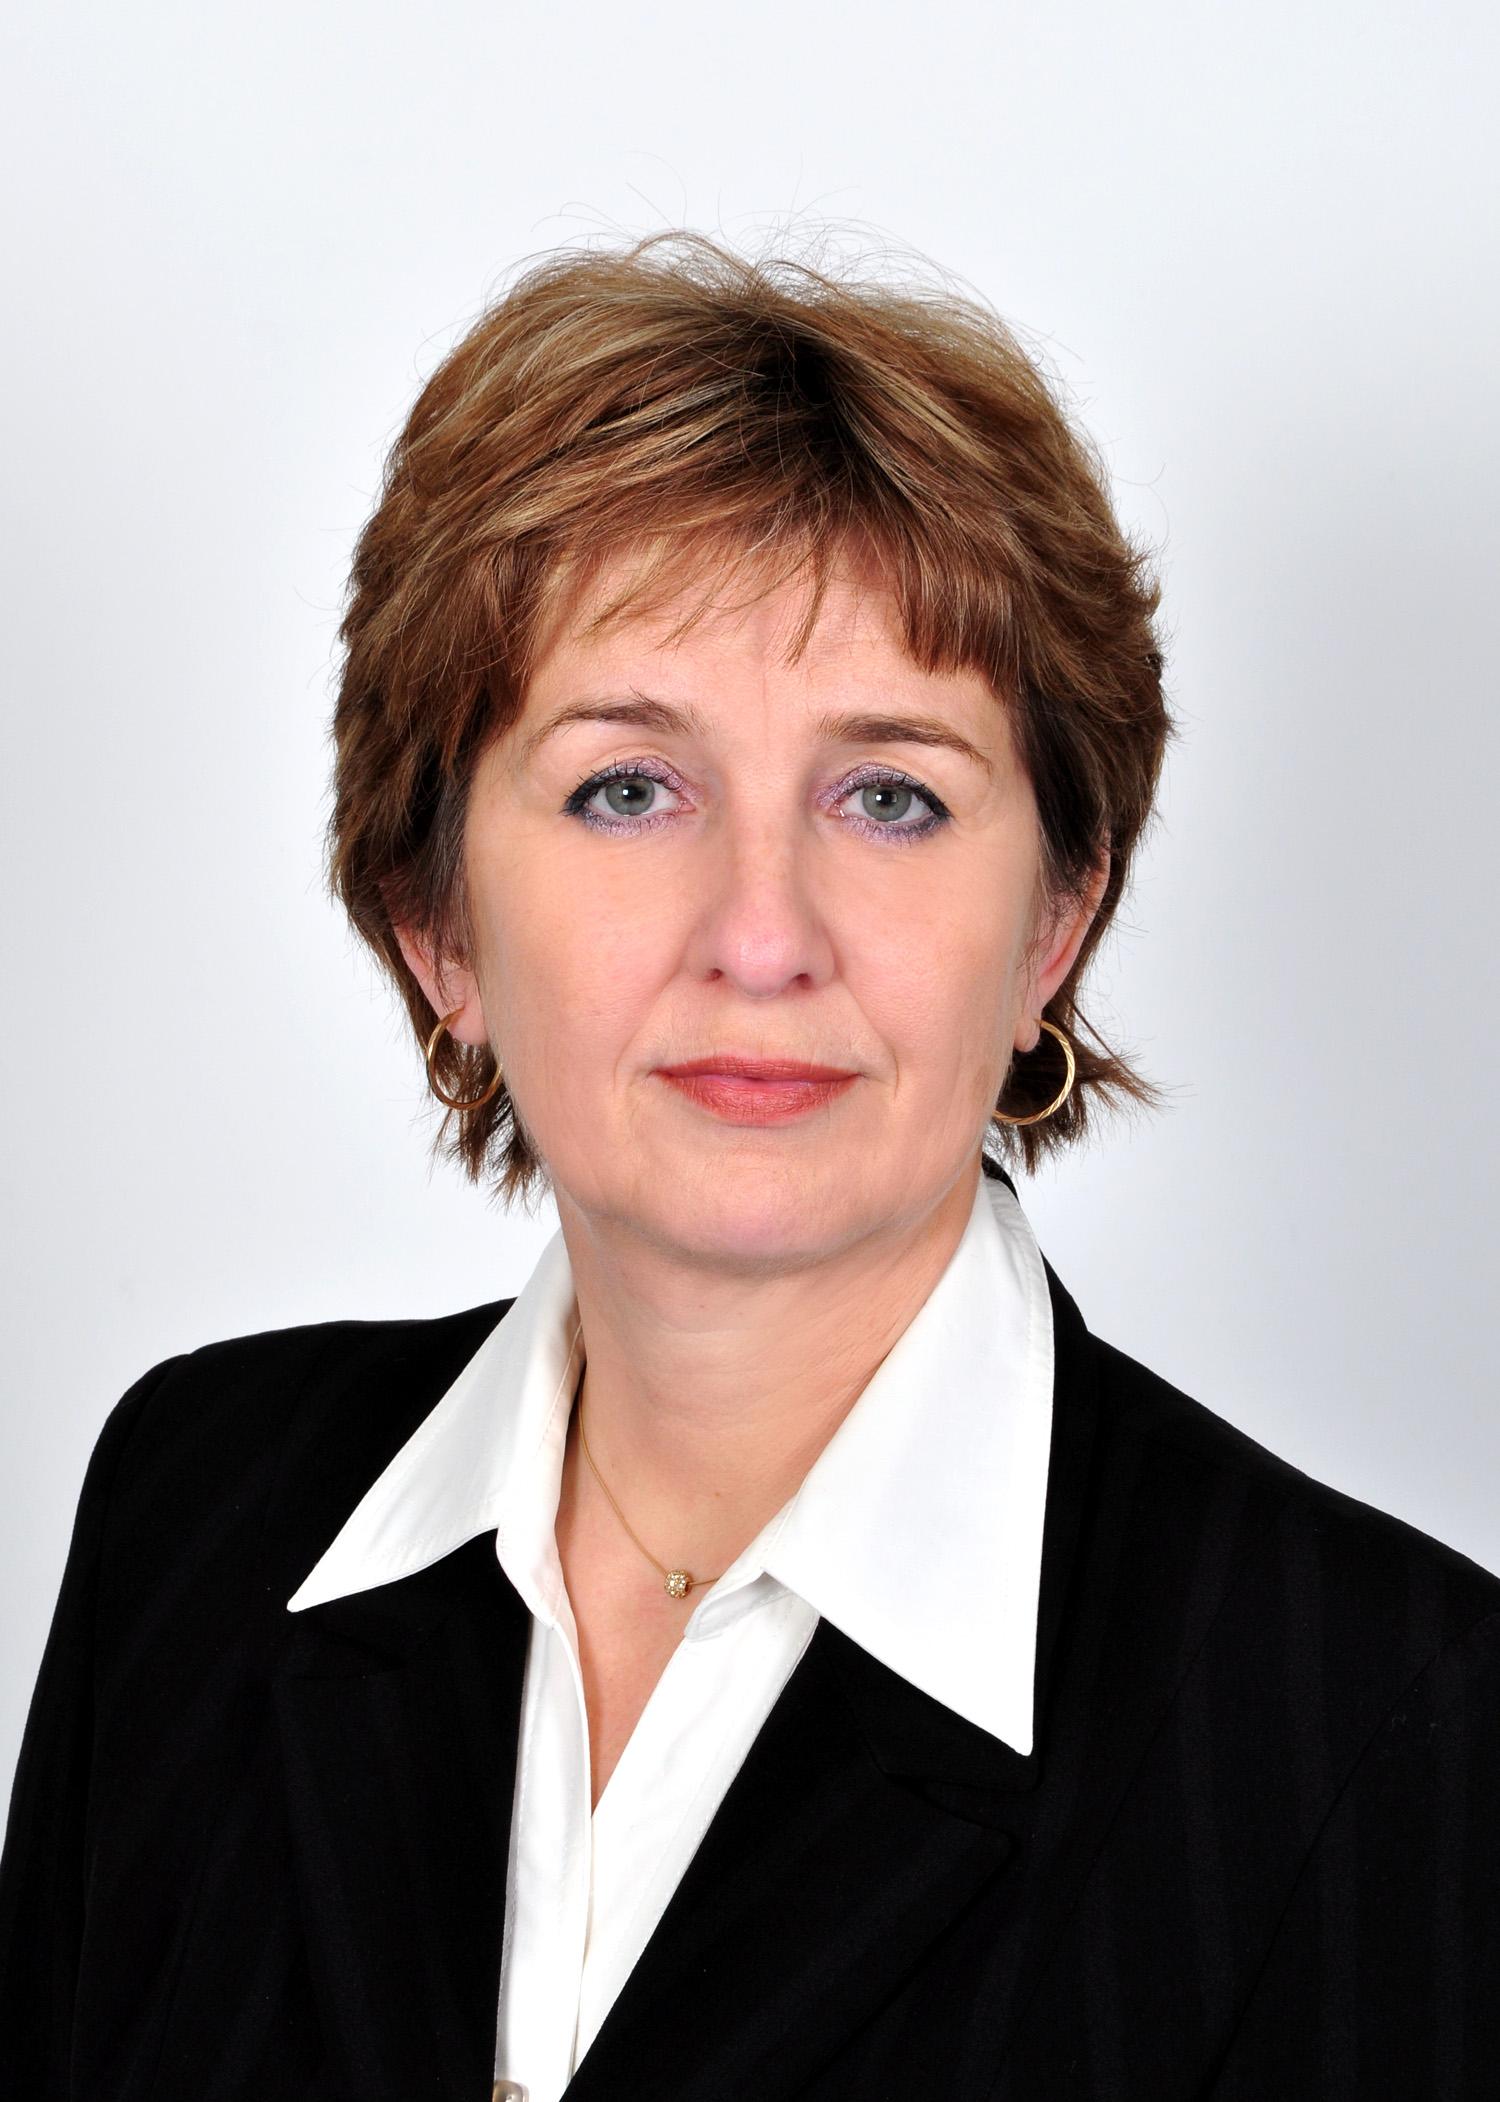 PhDr., Mgr. Jarmila Záborská-Kurhajcová, PCC